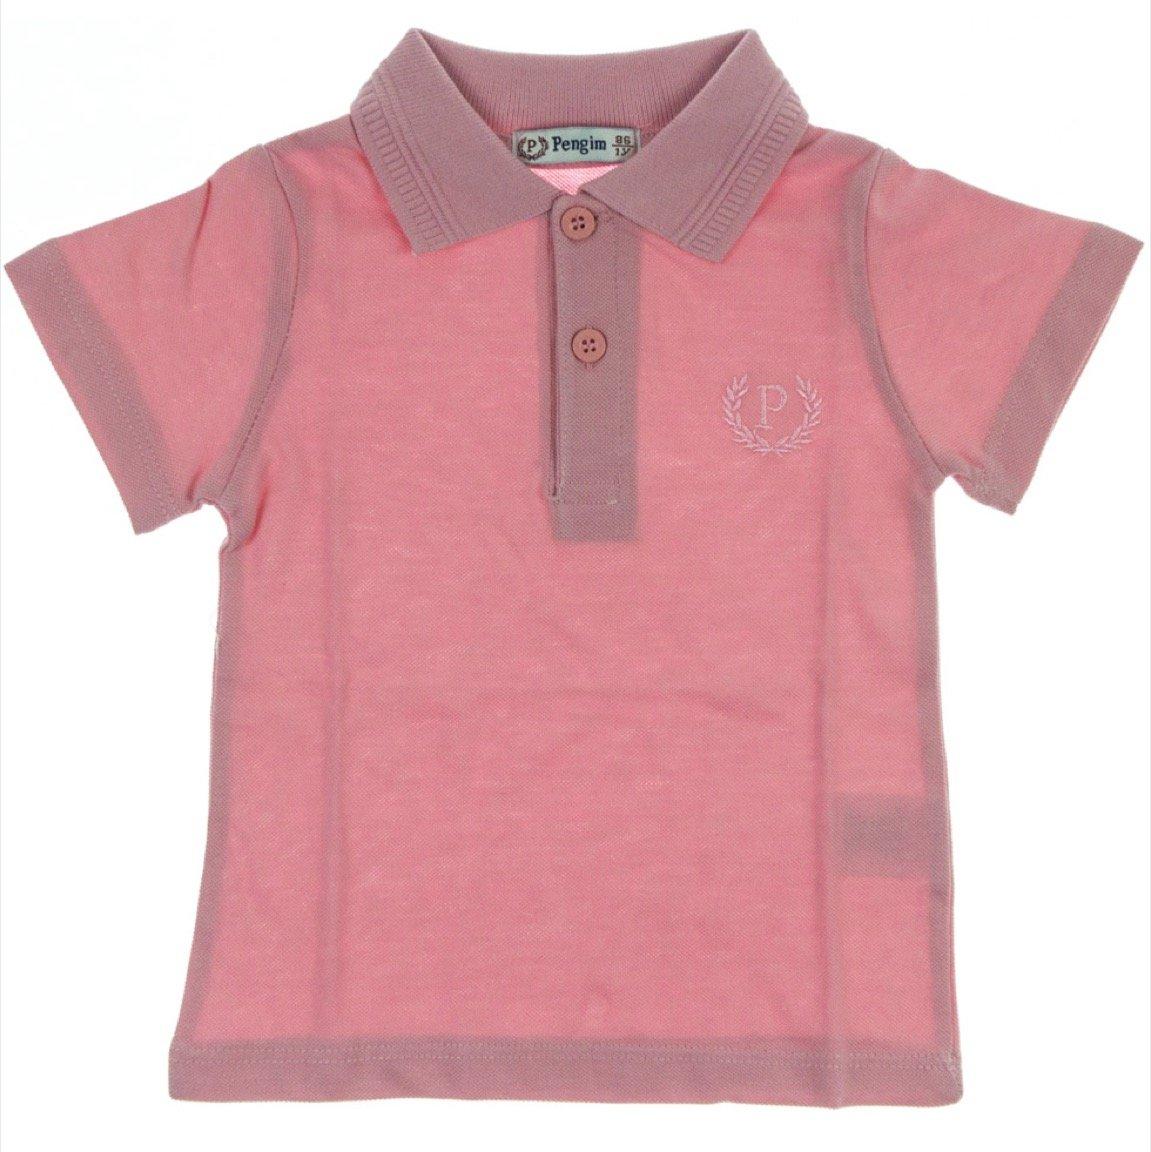 25ea8c5ac766 Pengim παιδική μπλούζα «Pink Polo Line» - b2b.AZshop.gr